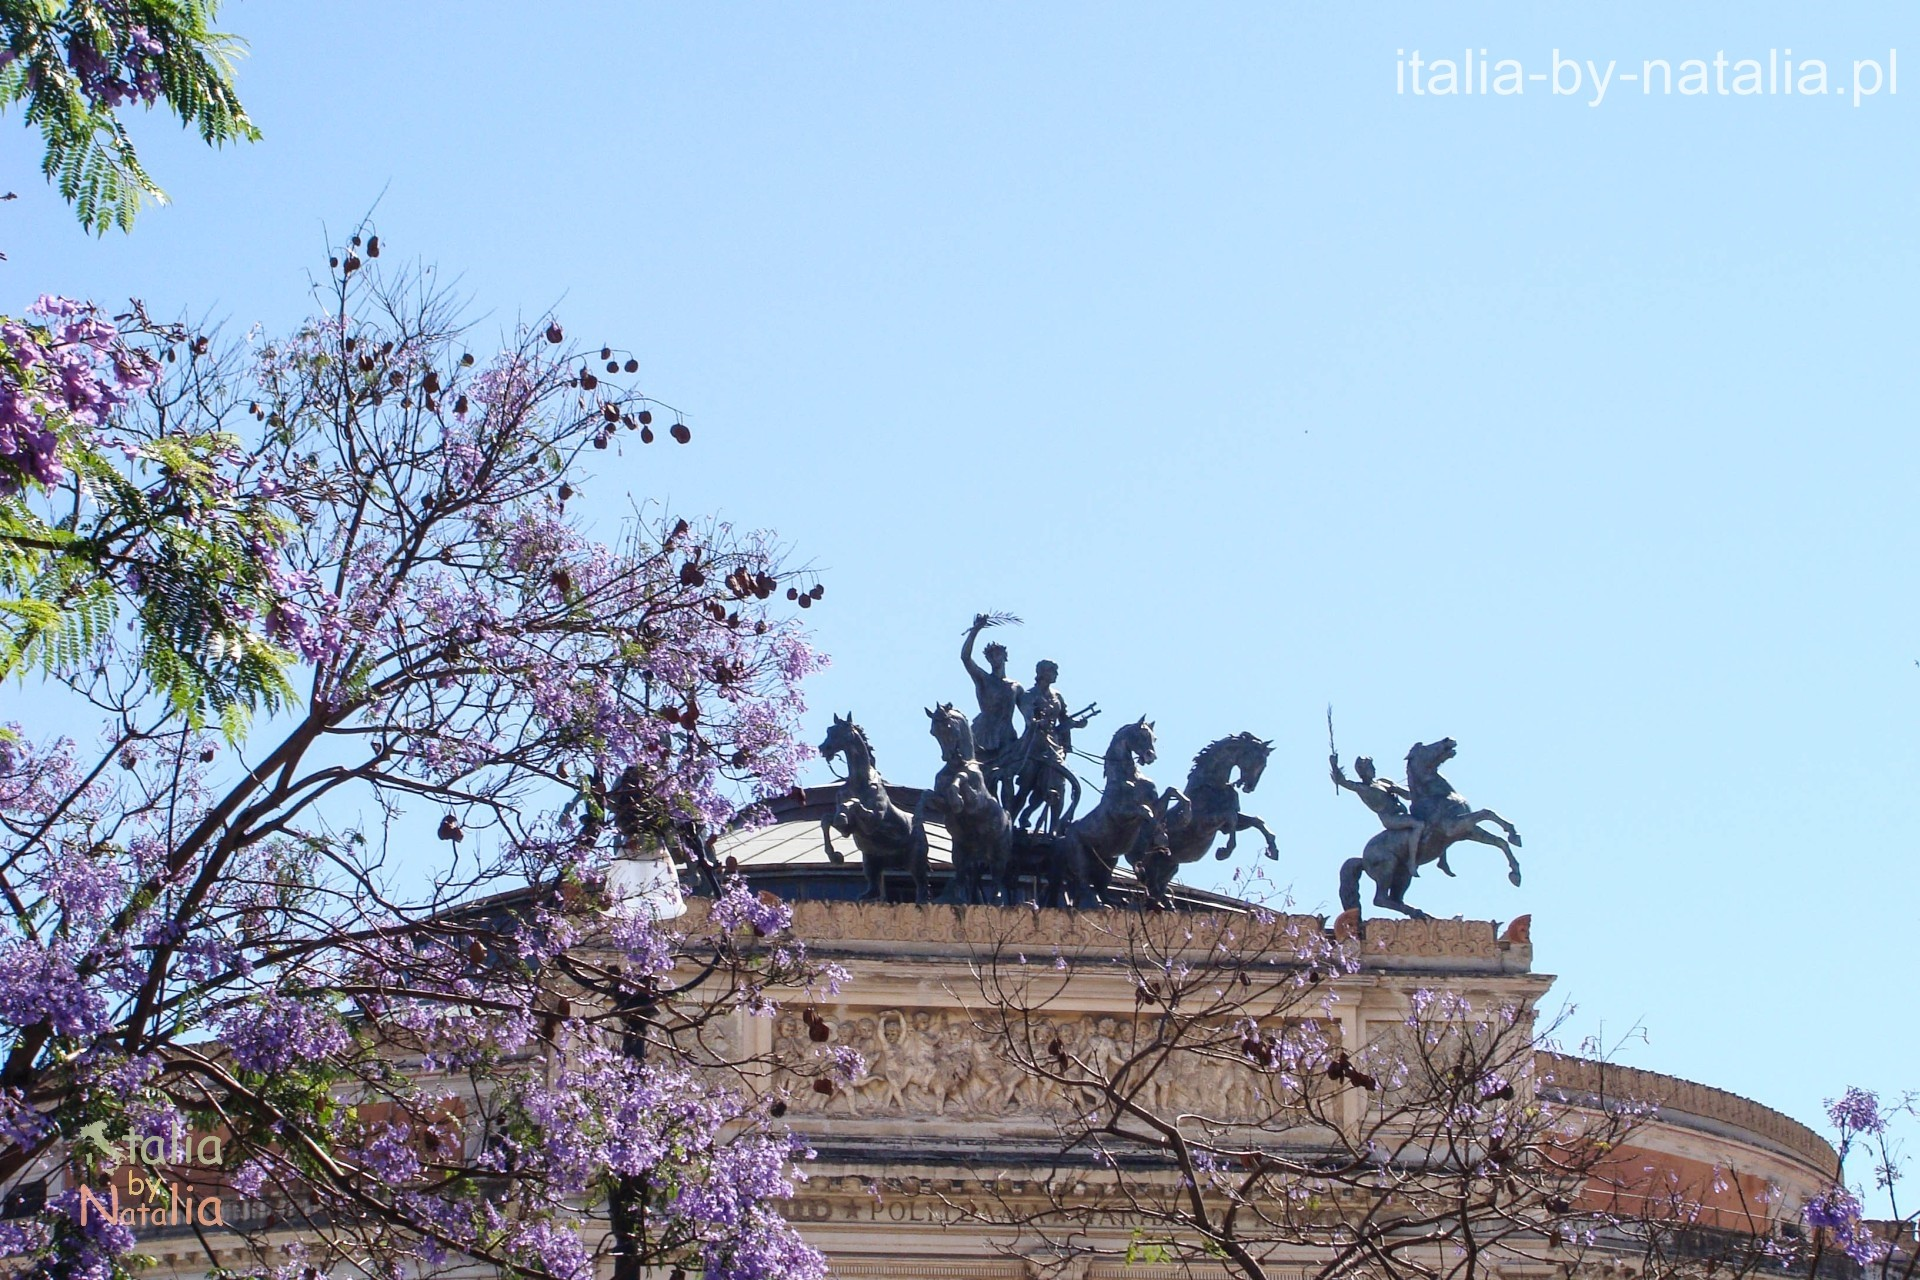 Palermo Sycylia Teatro Politeama Piazza Garibaldi Sicily